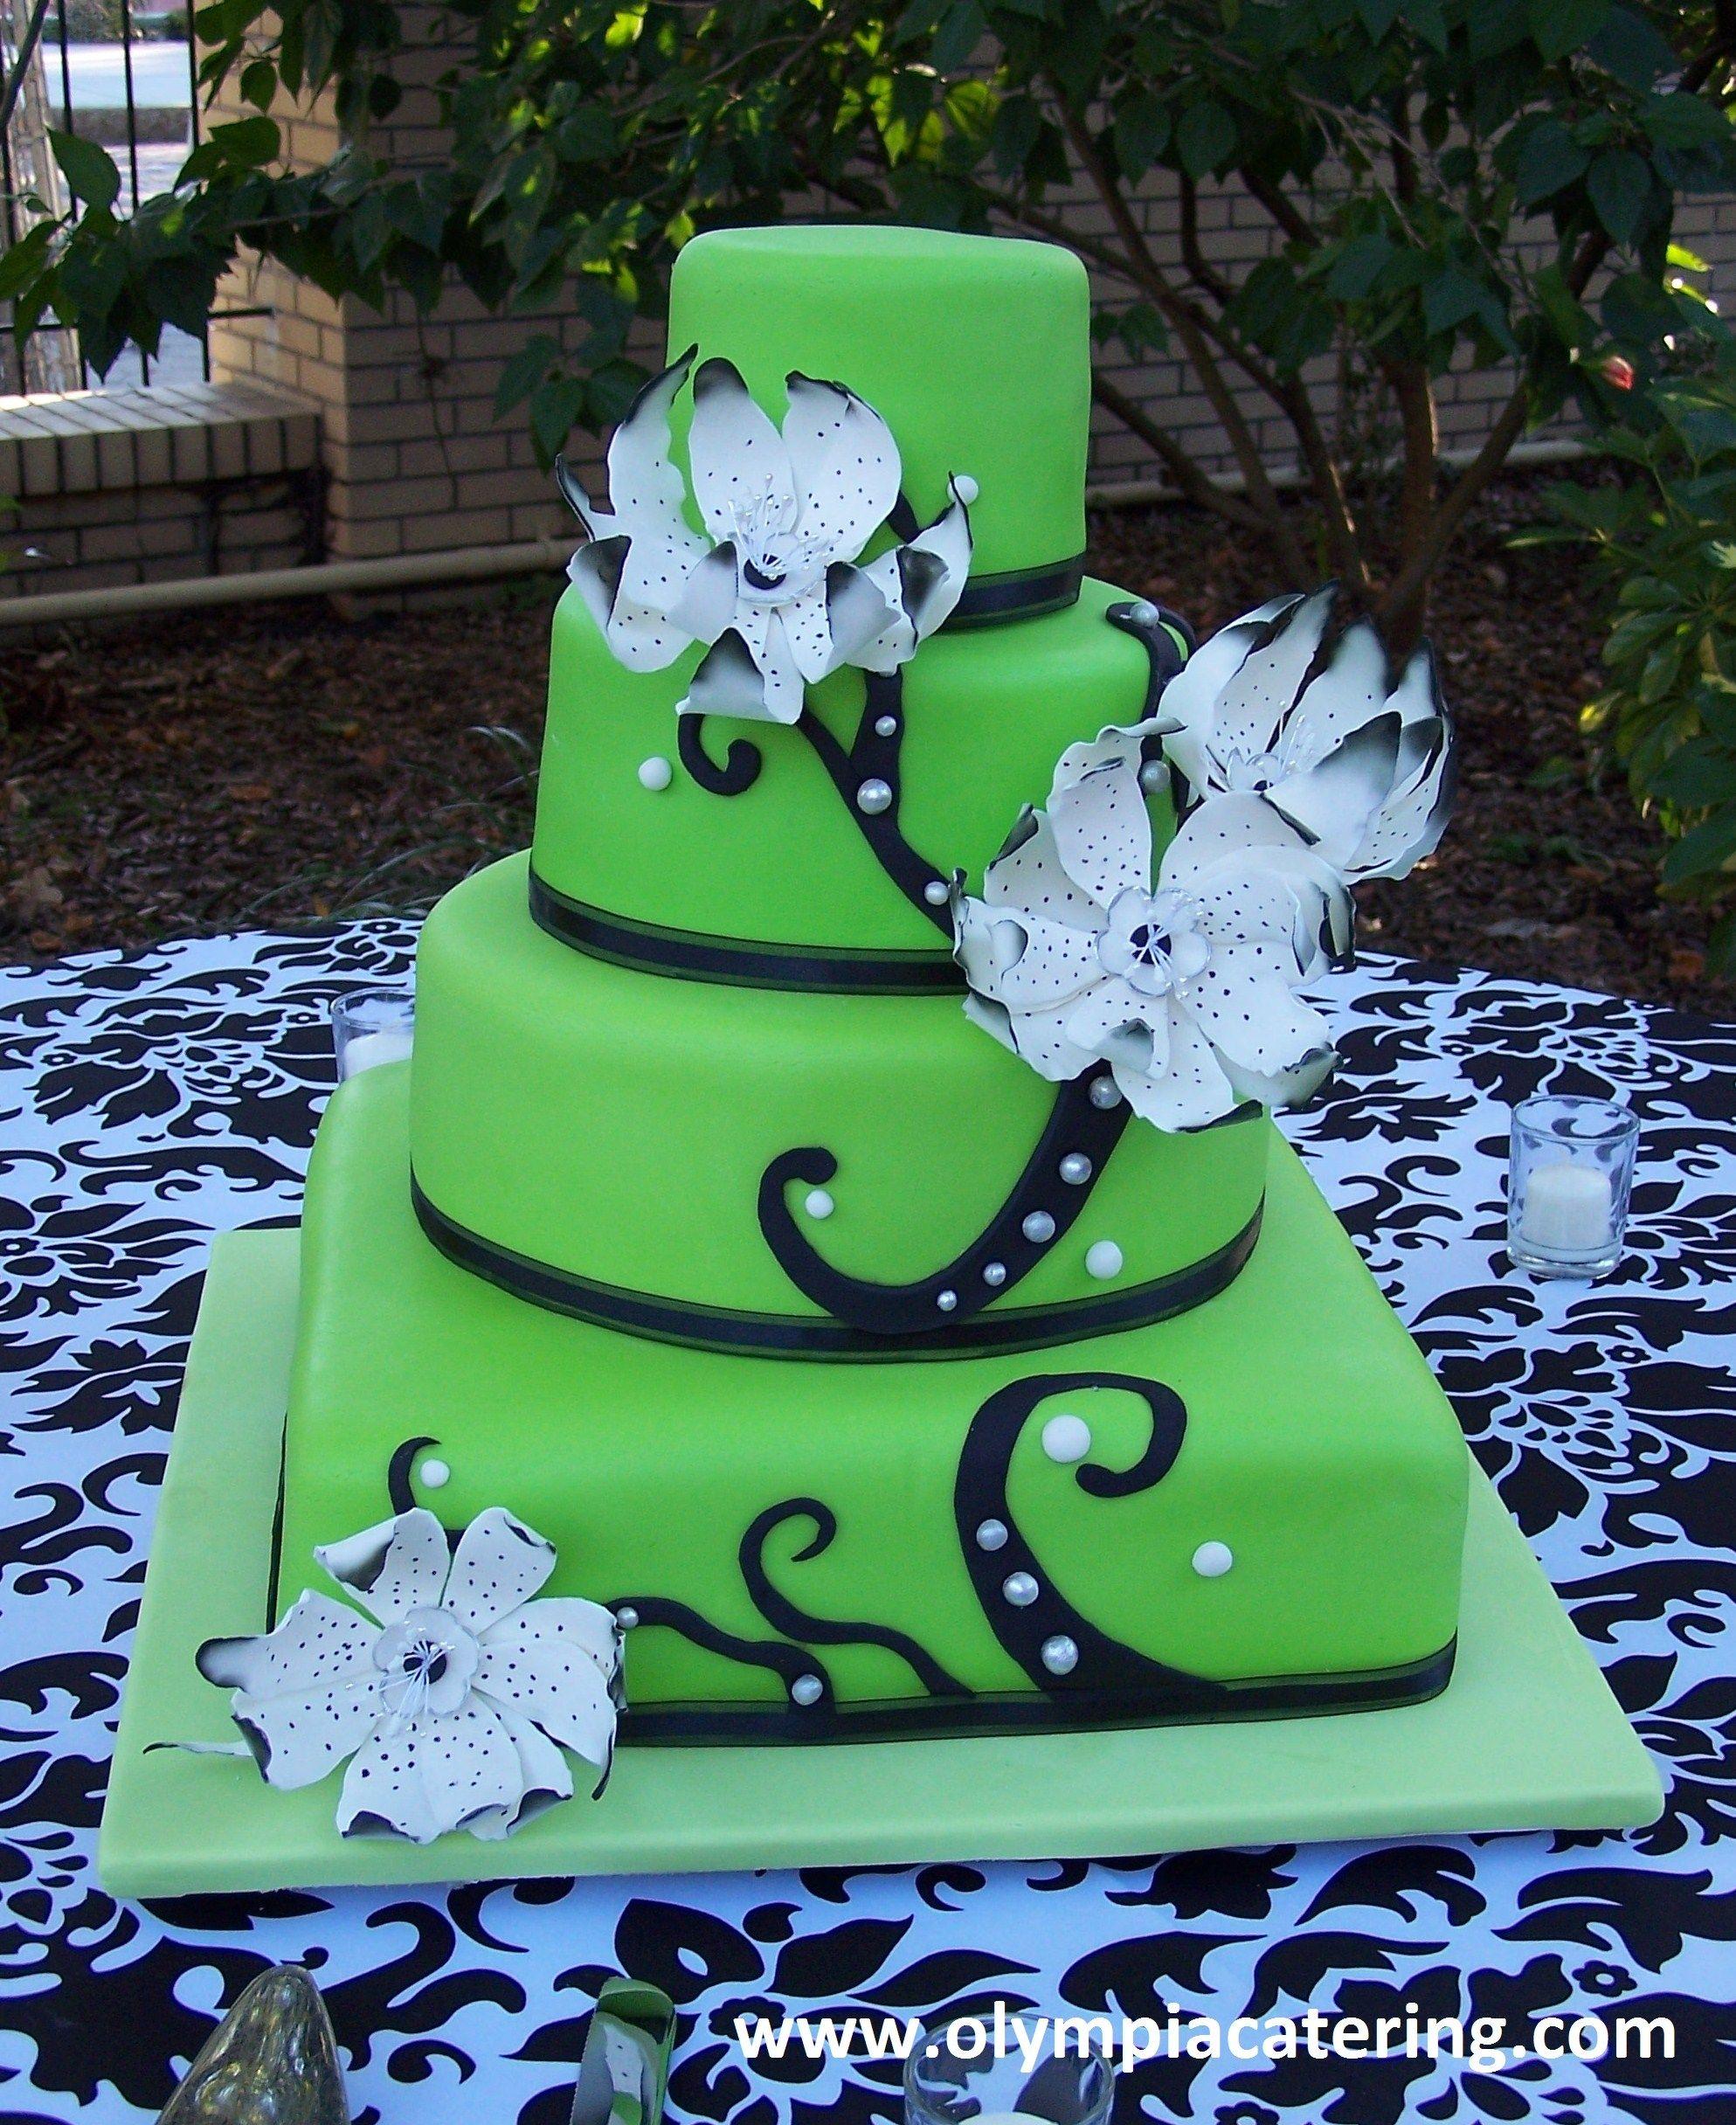 Round and Square Wedding Cake Green Fondant